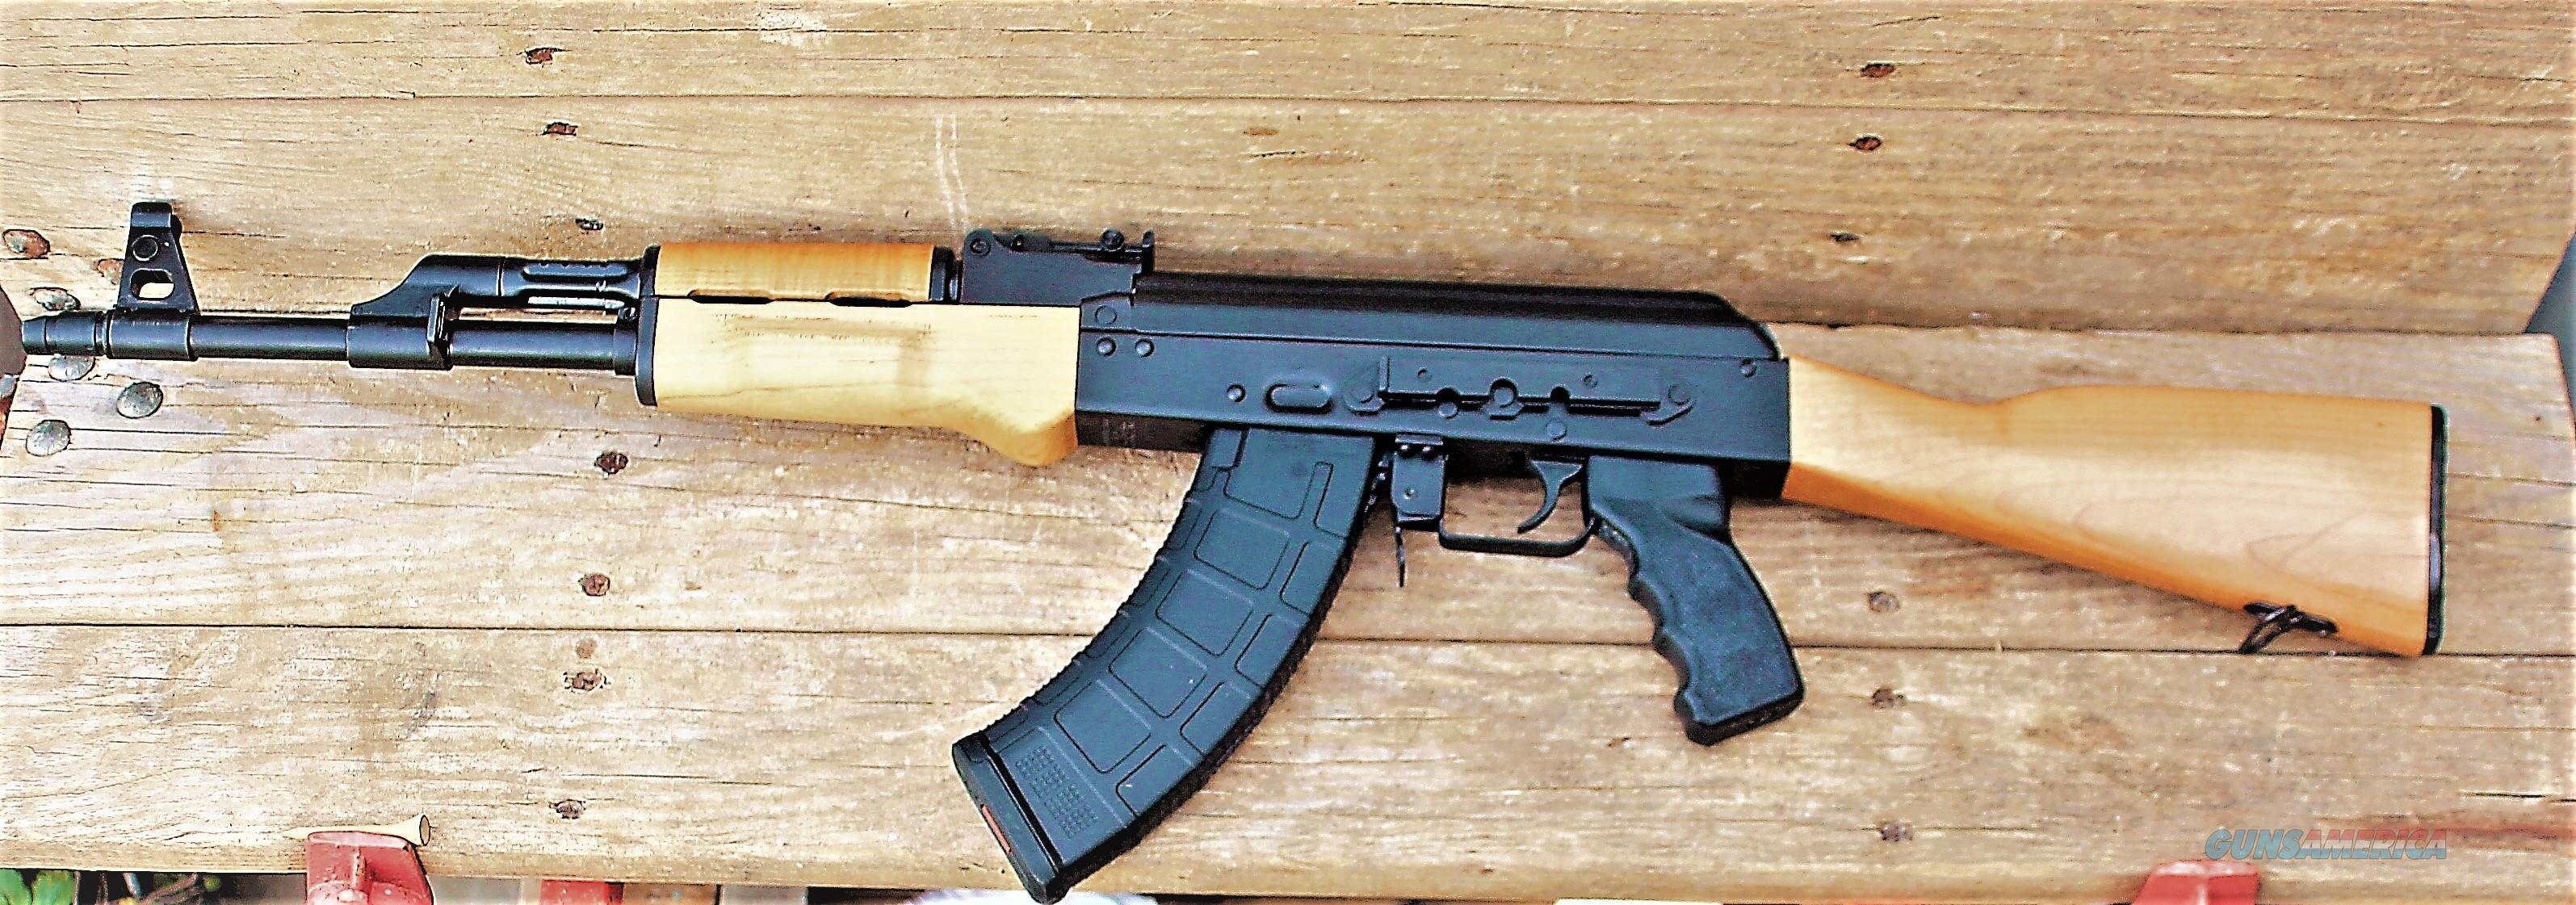 $57  EASY PAY DOWN Century Red Army Standard CIA AK-47   Stamped Receiver RAS47 16.5 chrome lined Barrel 1:10 twist 7.5 lbs weight Slant Muzzle Brake Ak47 7.62x39mm Wood 30rds 30RD Magazine RI2403N   Guns > Rifles > Century International Arms - Rifles > Rifles